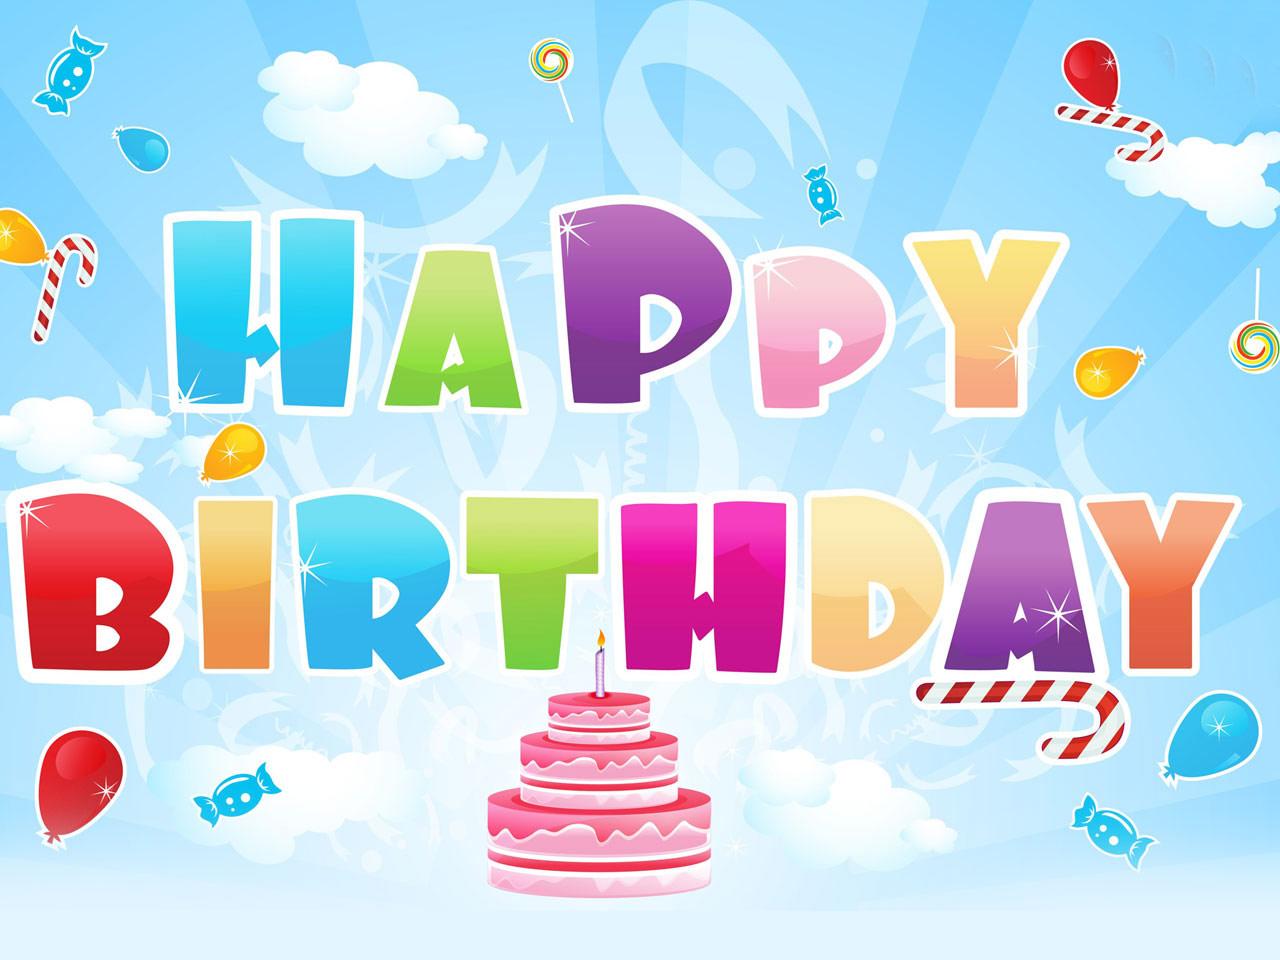 http://4.bp.blogspot.com/-JgVodGjt6yw/T_dDPsTx8SI/AAAAAAAADxY/jhsVEXrp-wI/s1600/birthday+wallpapers3.jpg